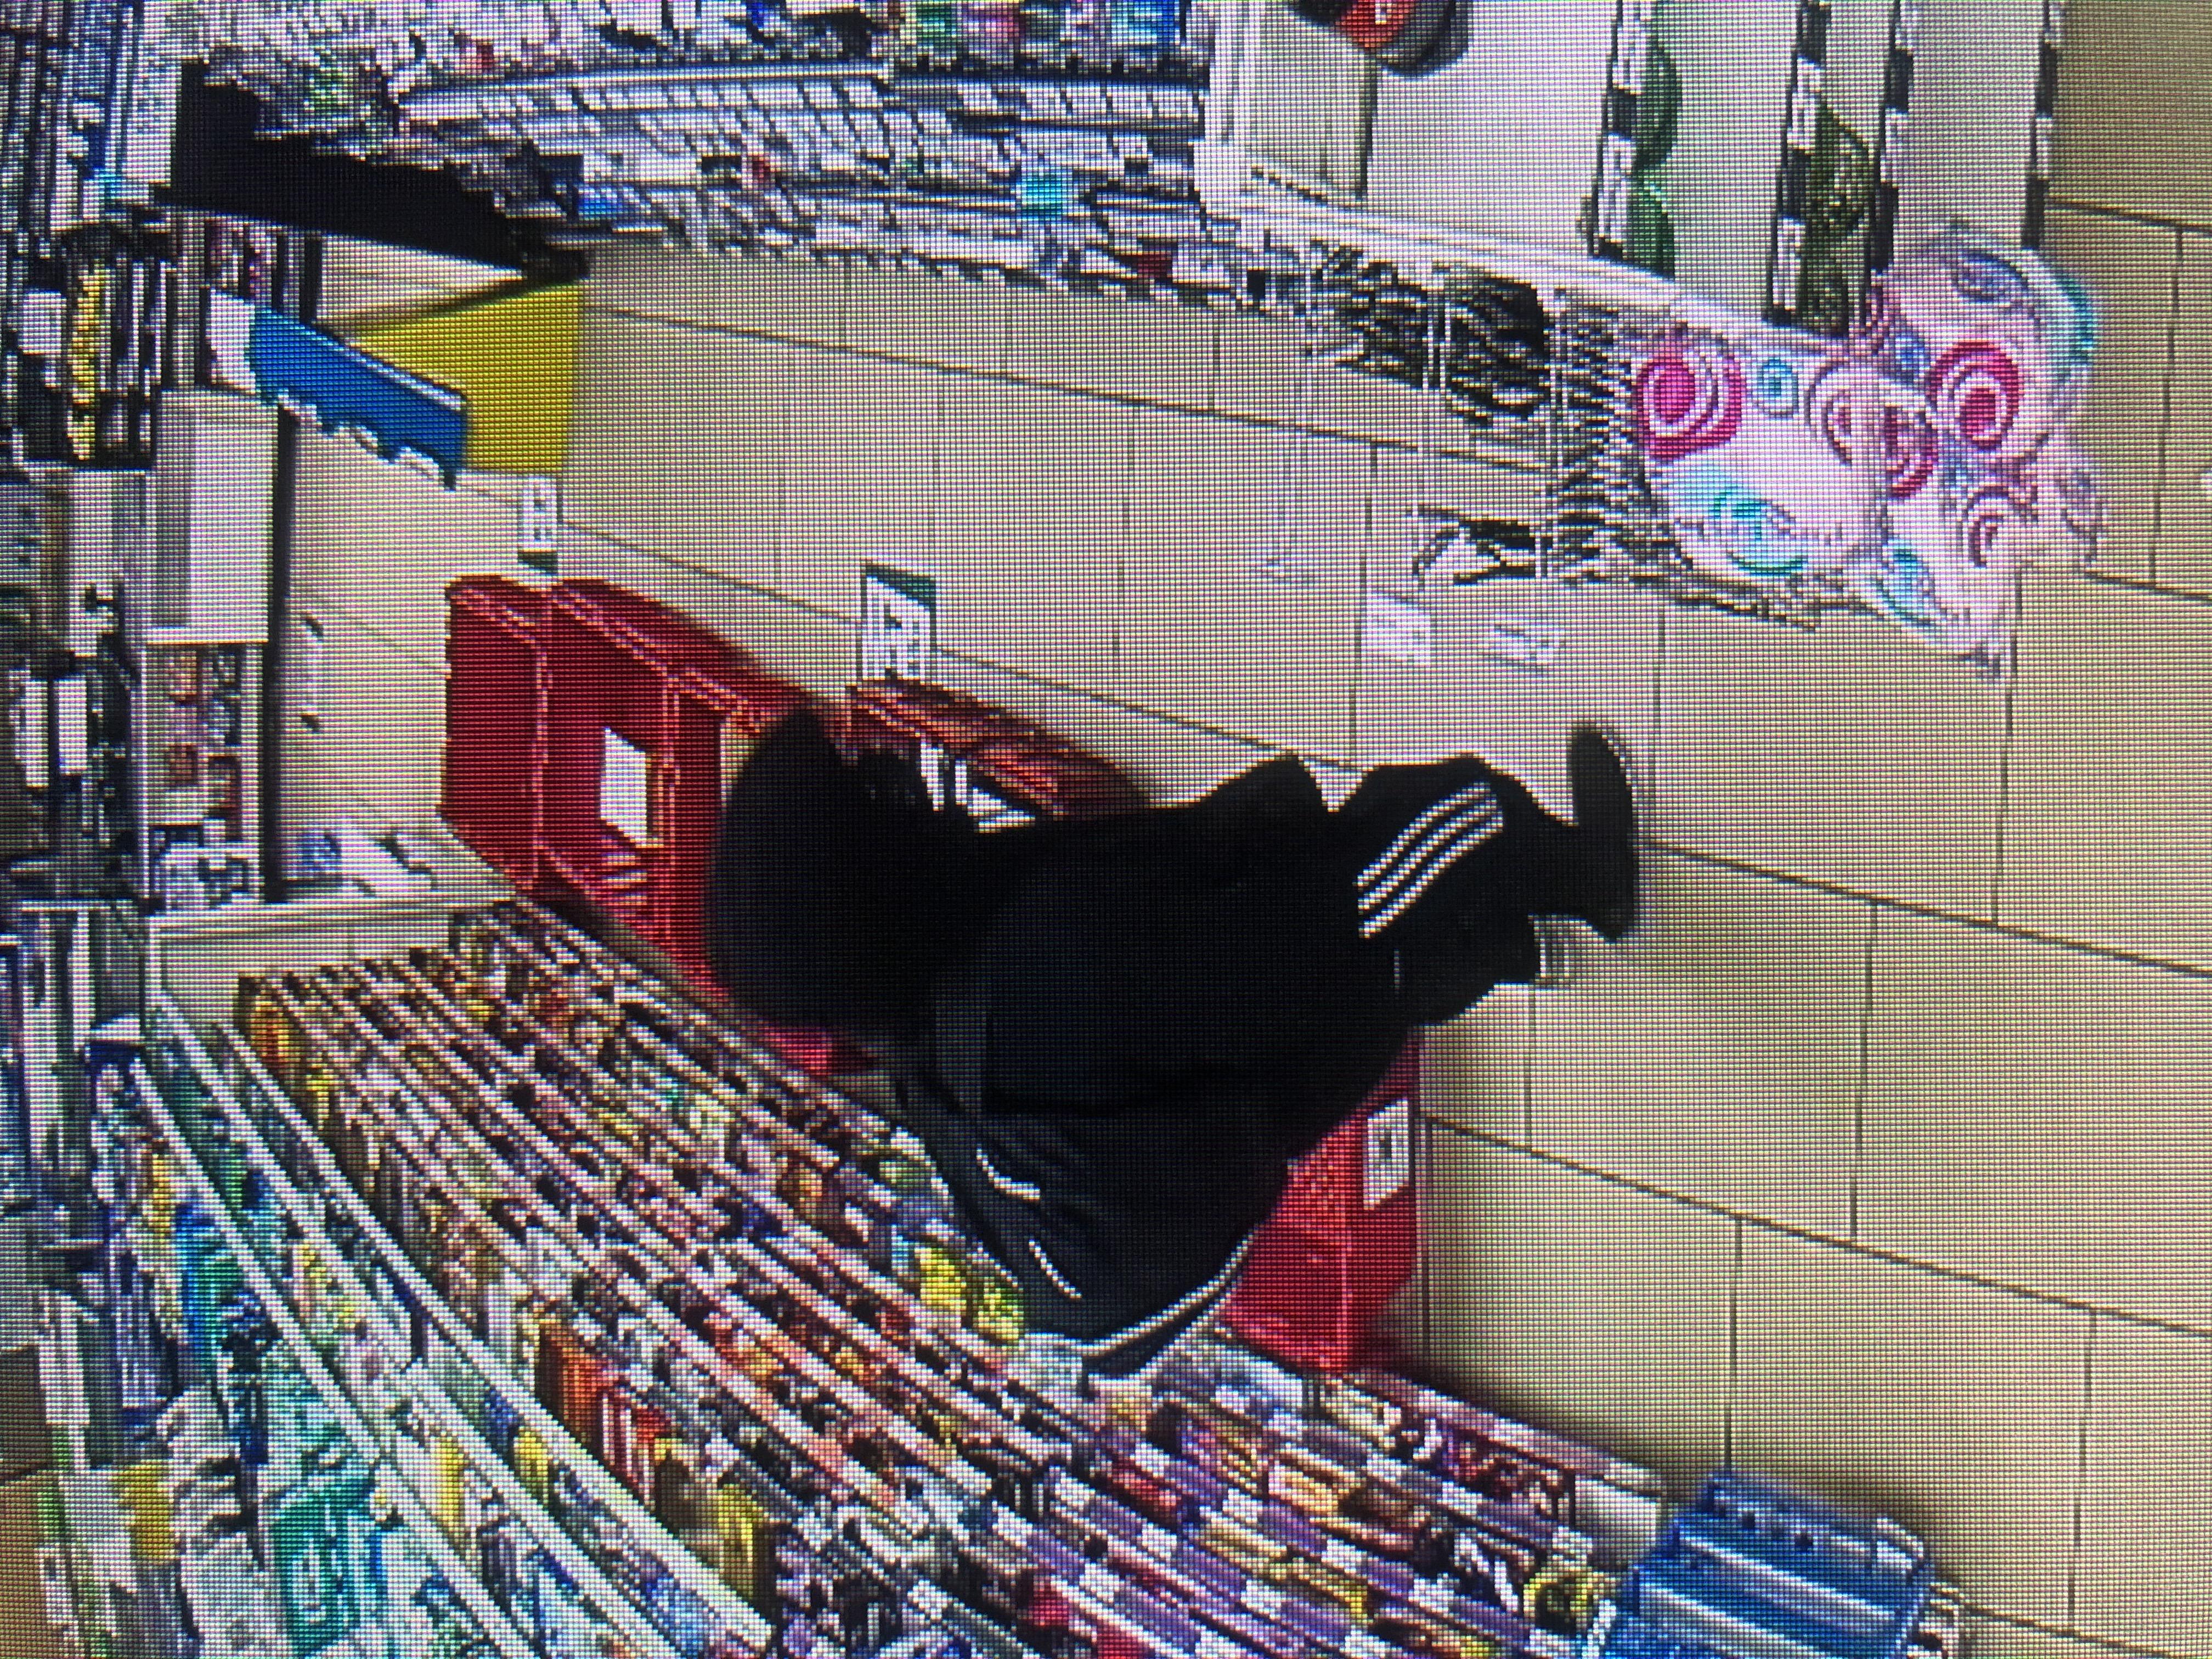 Image 2: Robbery Suspect